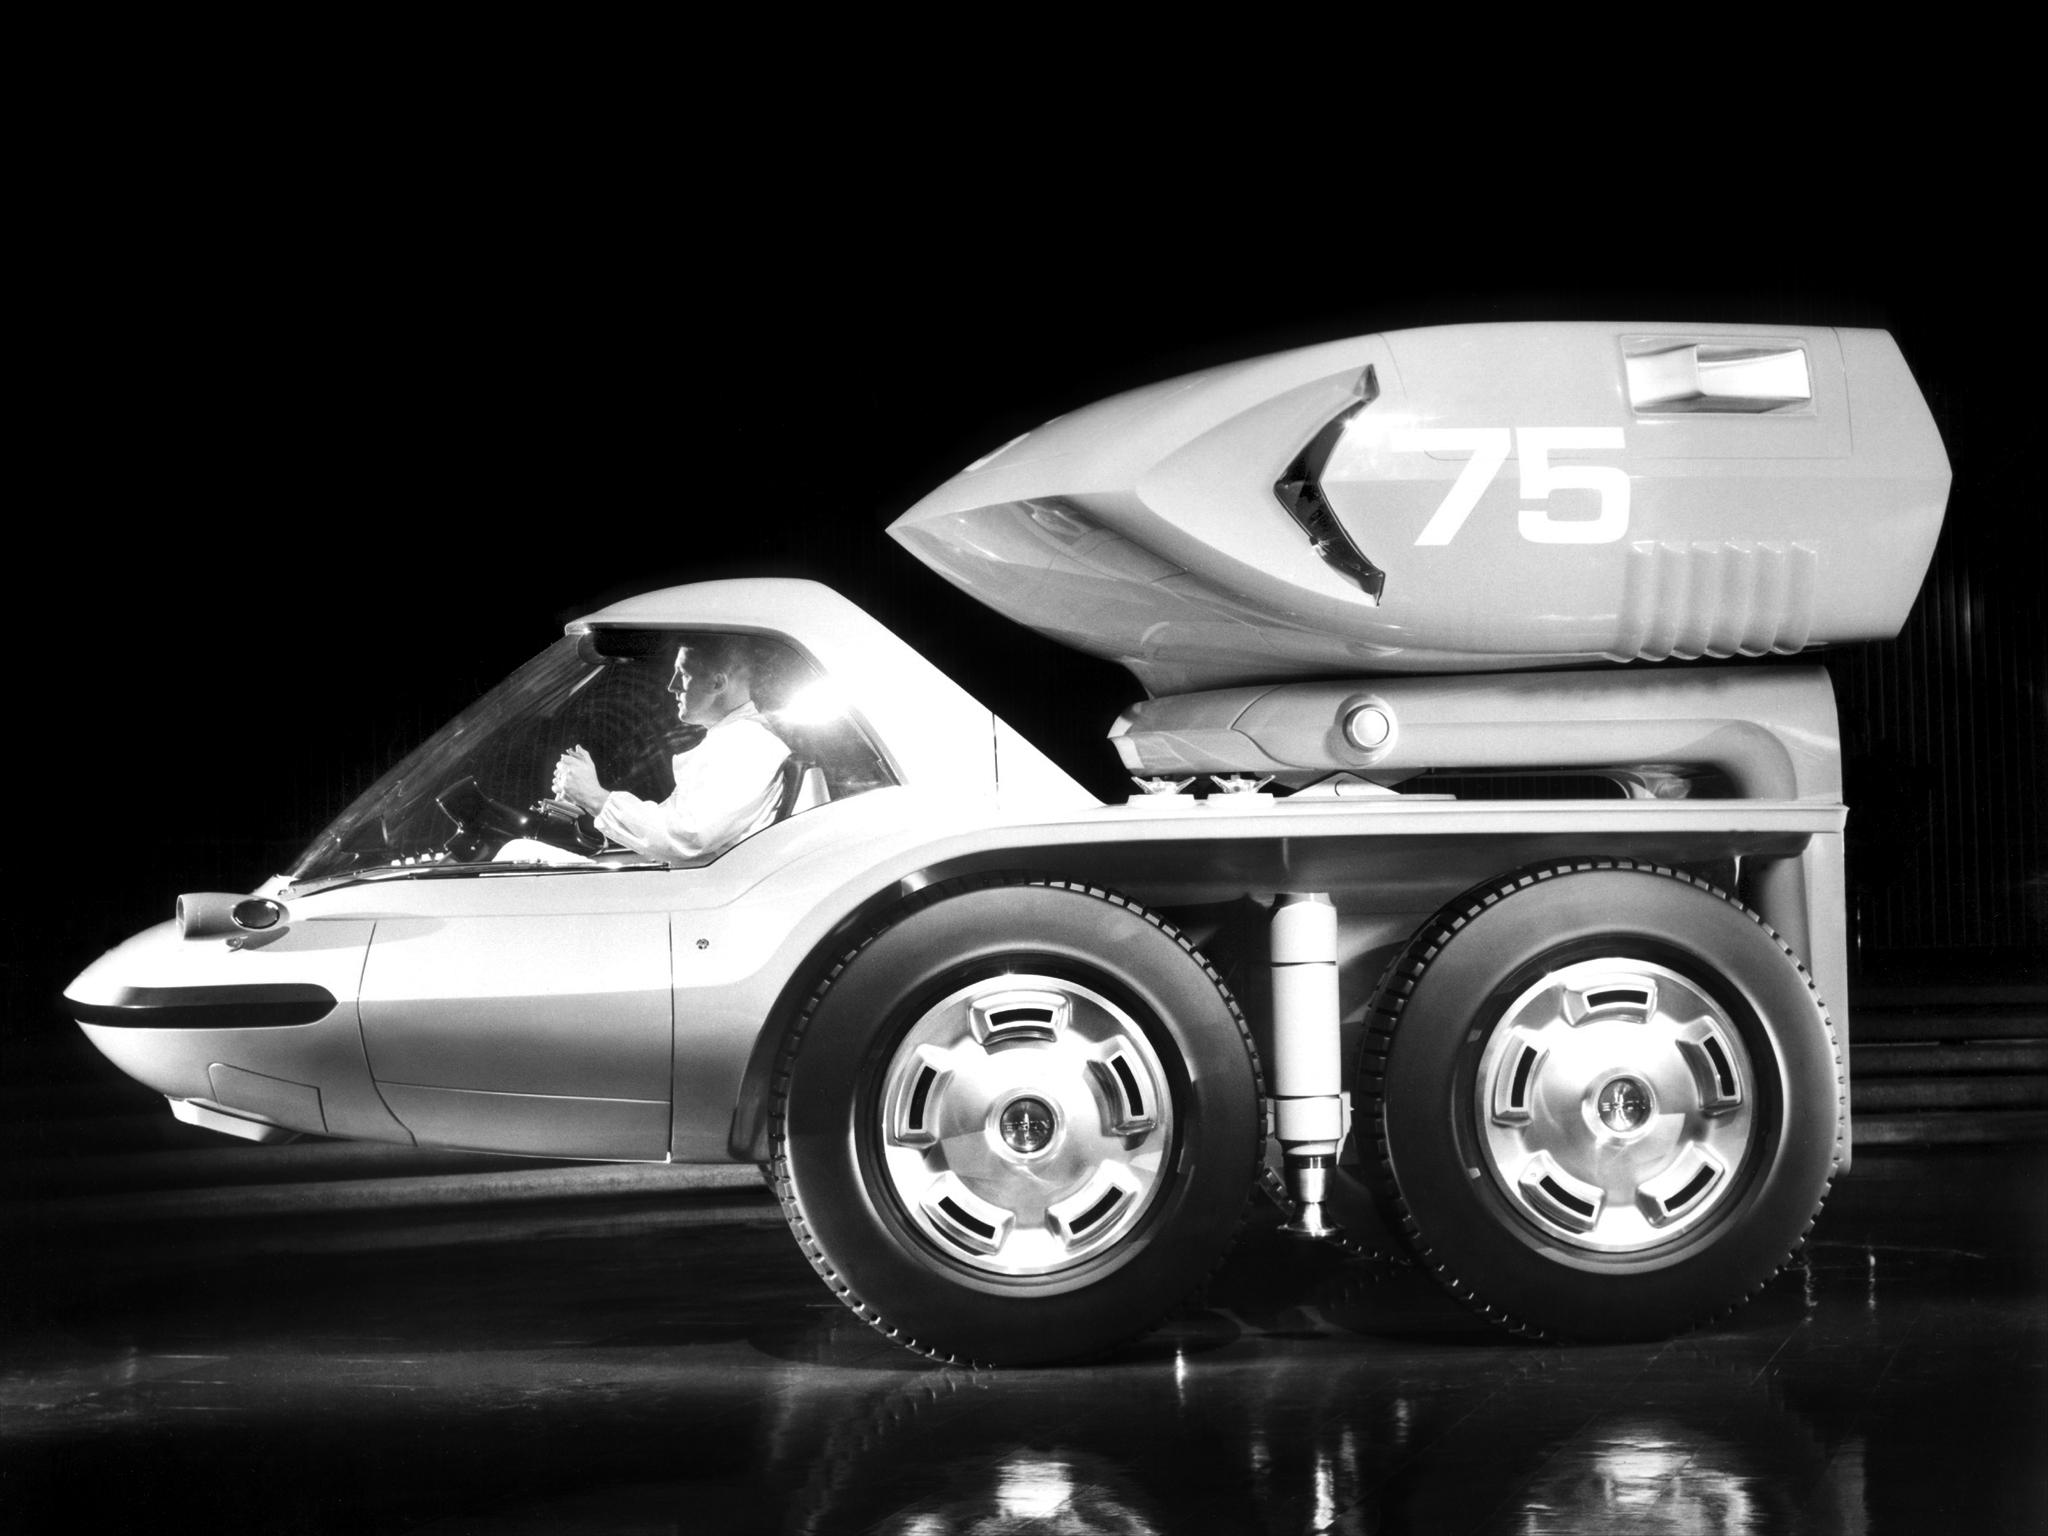 1964_GM_Bison_Concept_Turbine_Truck_02.j